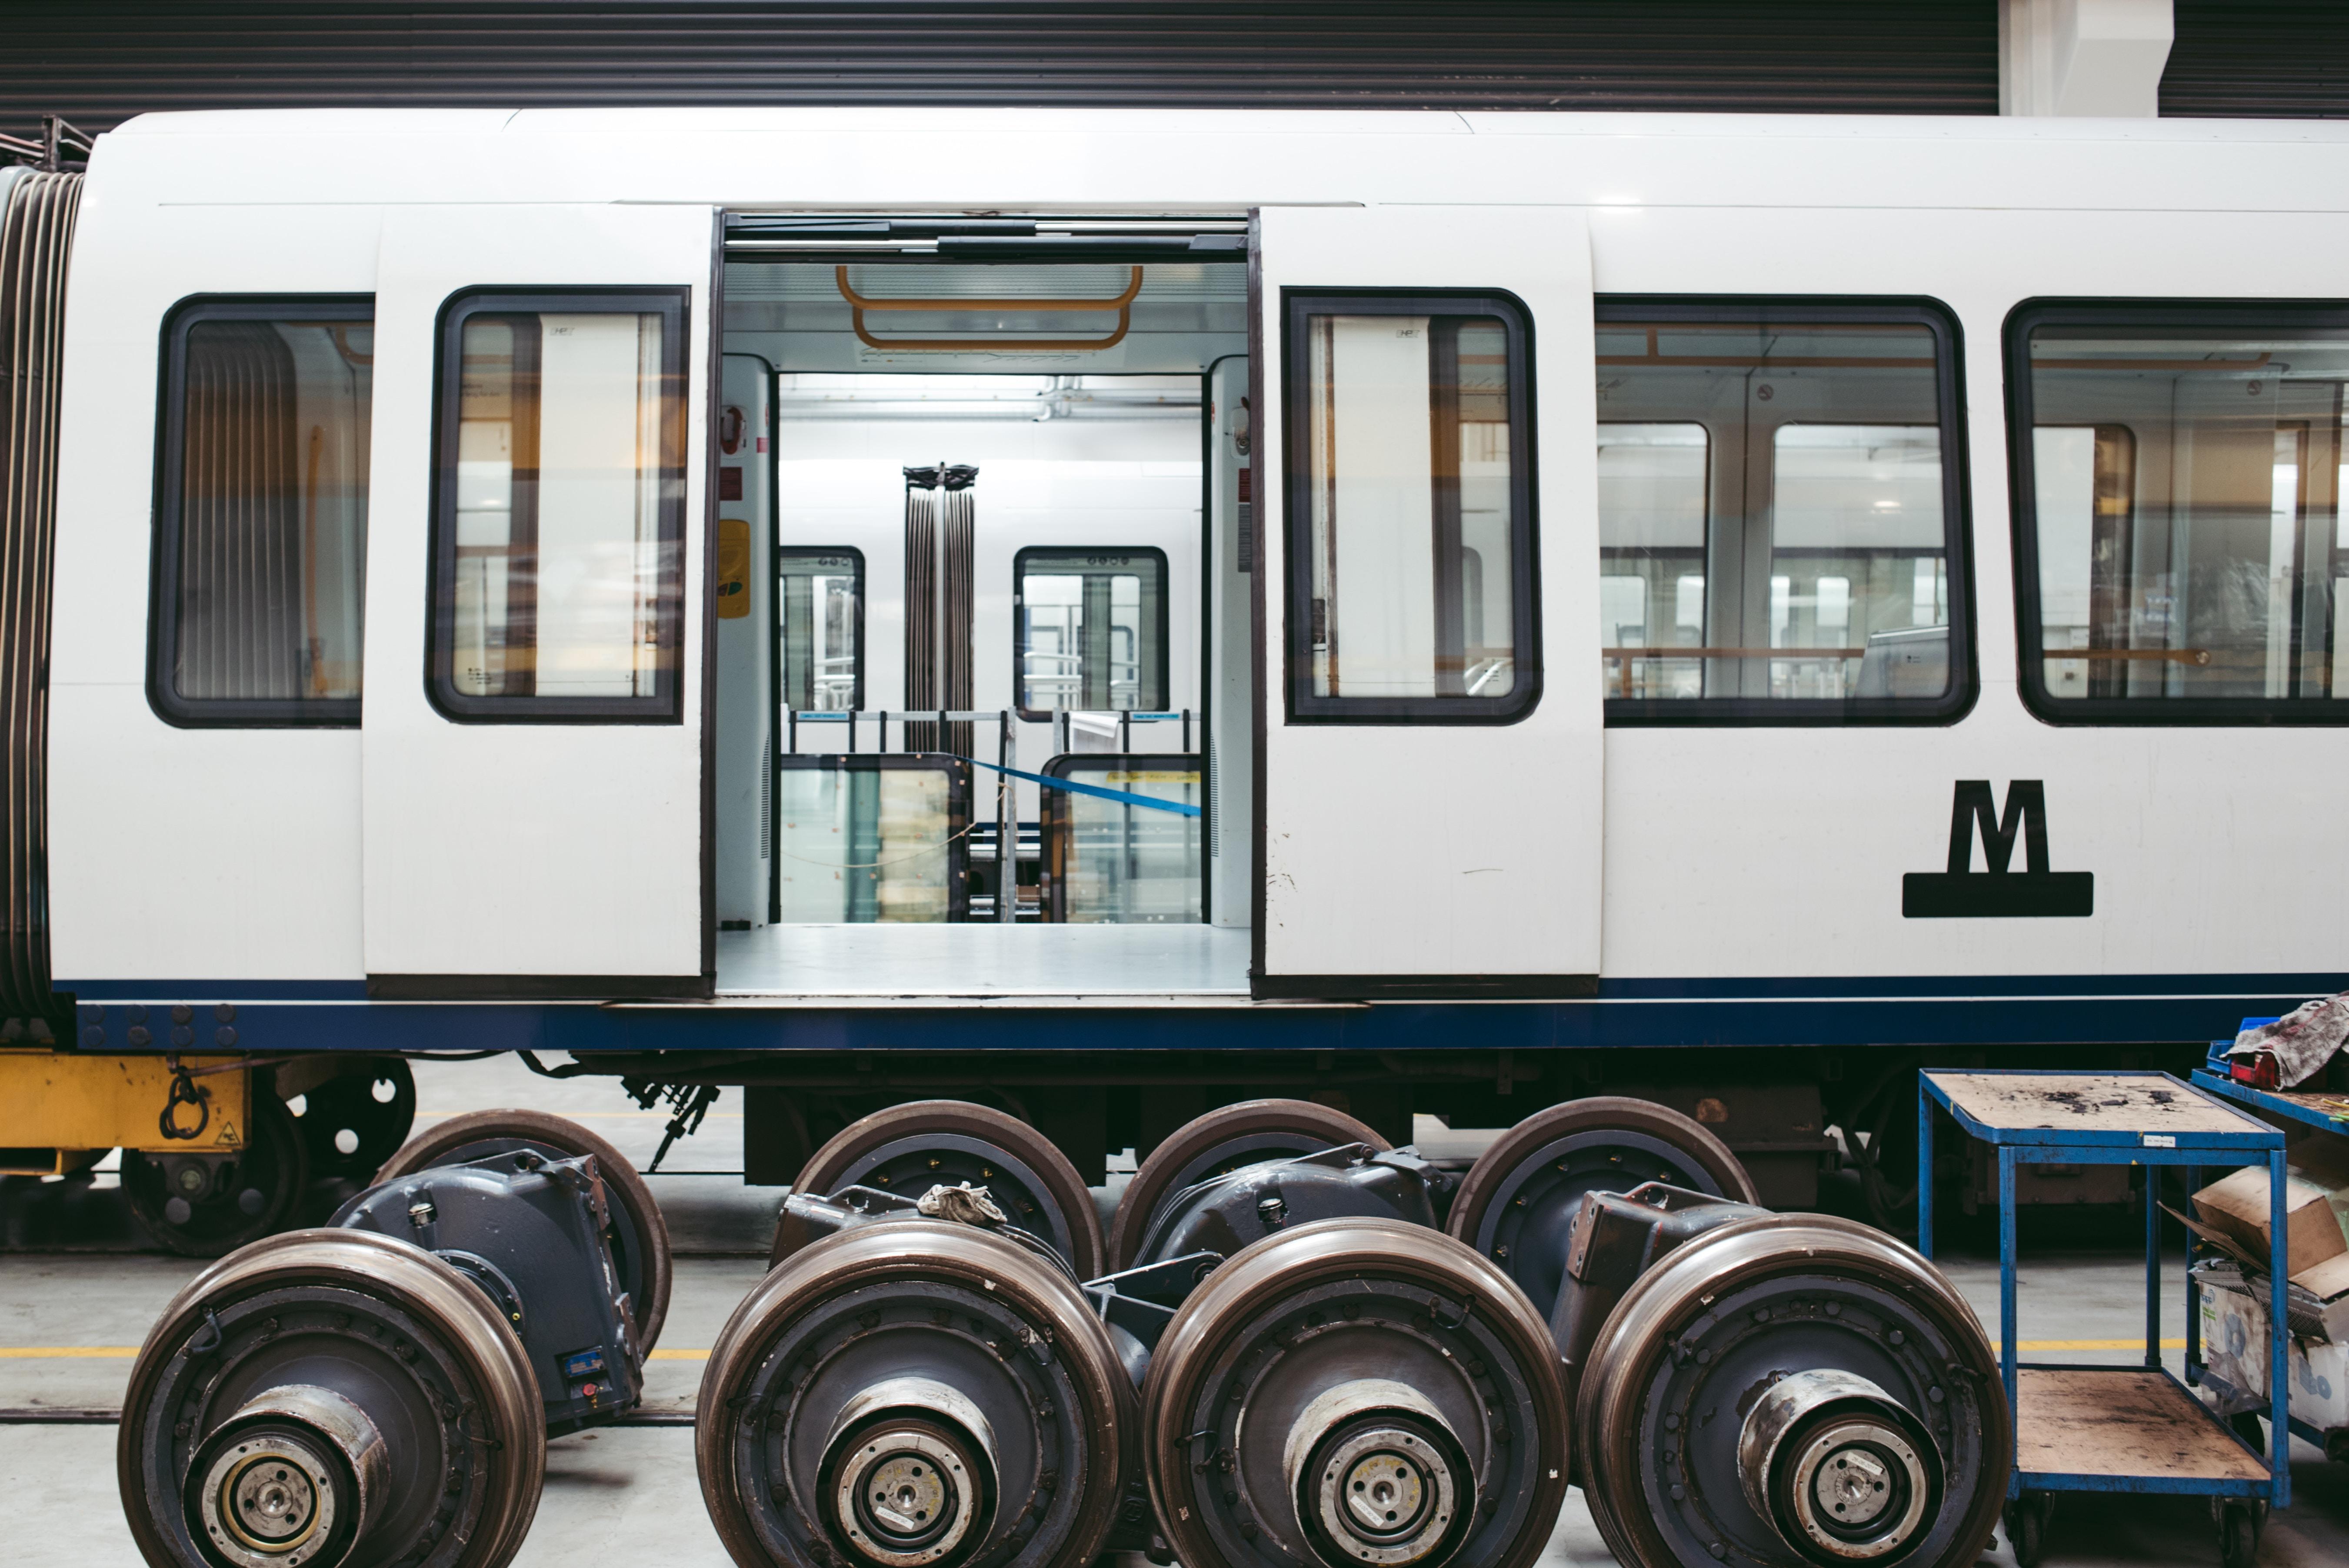 Subway car in a hangar for routine repairs